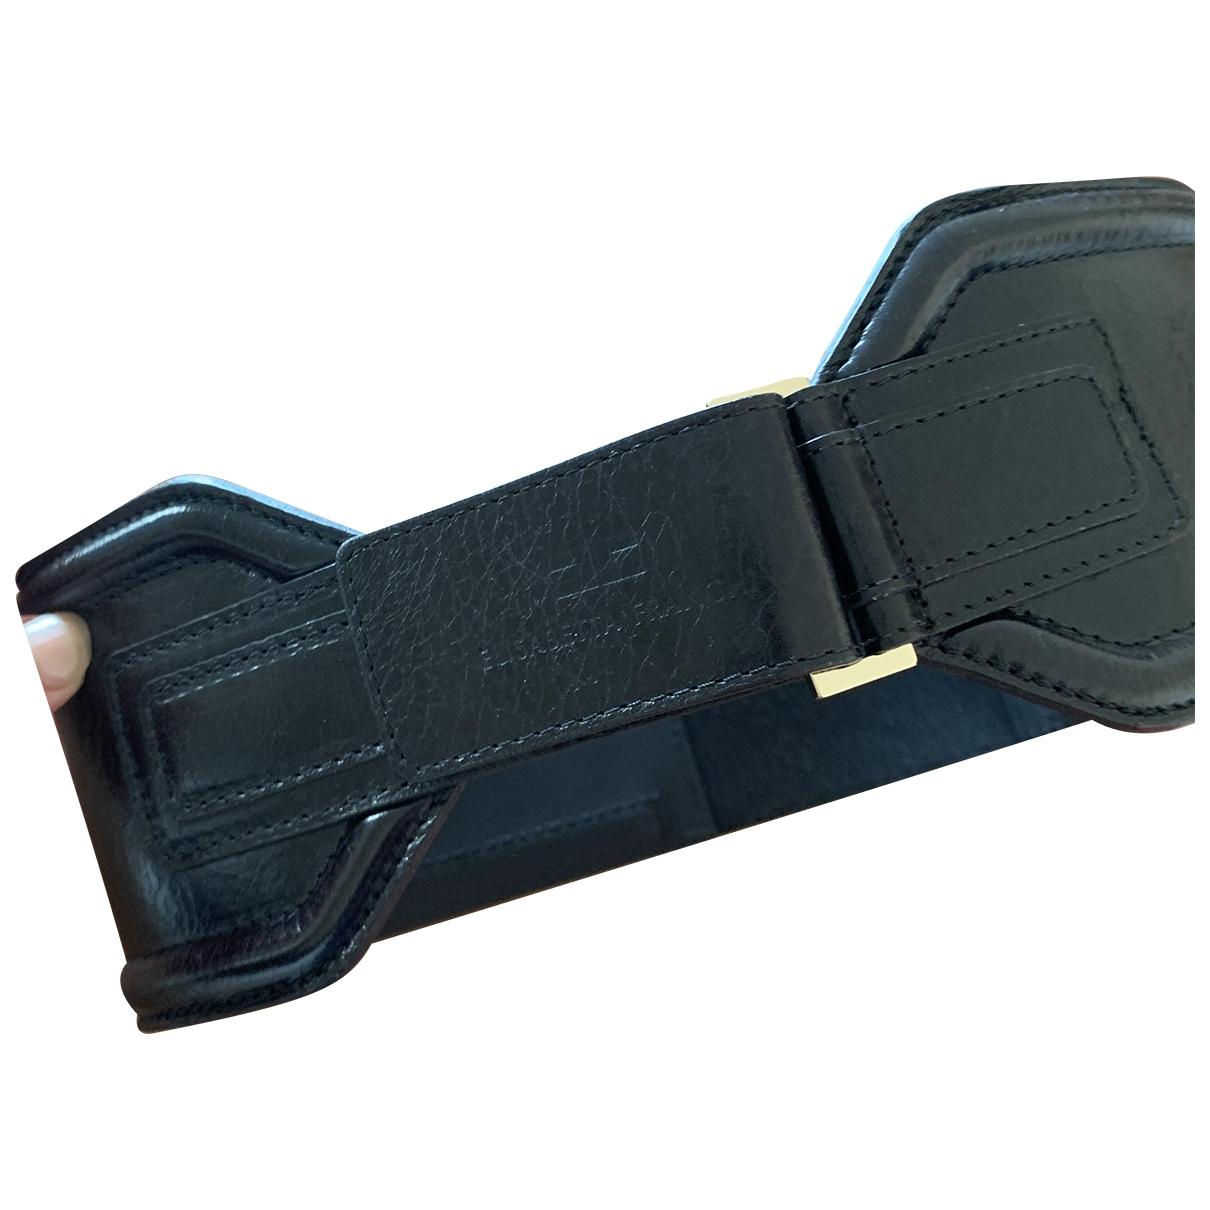 Elisabetta Franchi \N Black Leather belt for Women S International